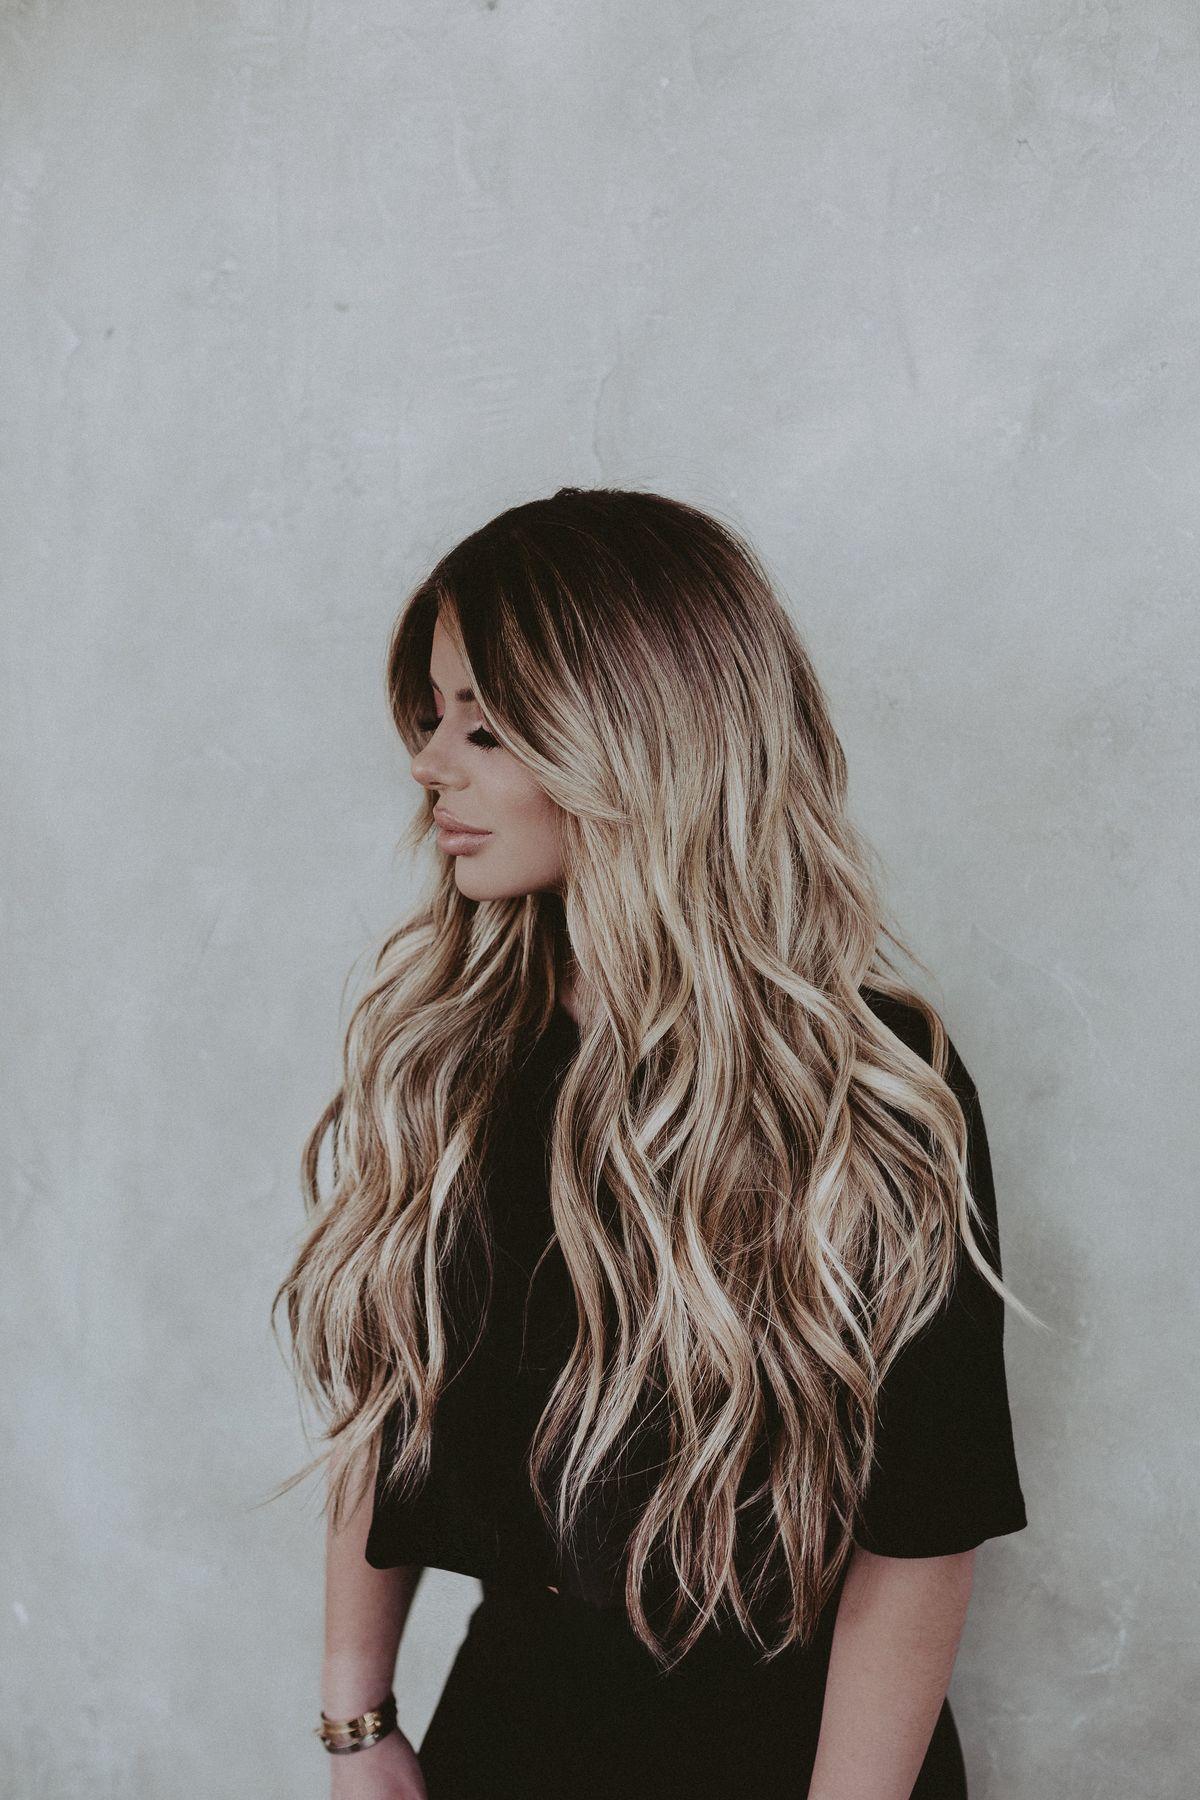 Hair Inspiration 2019-03-25 17:14:36